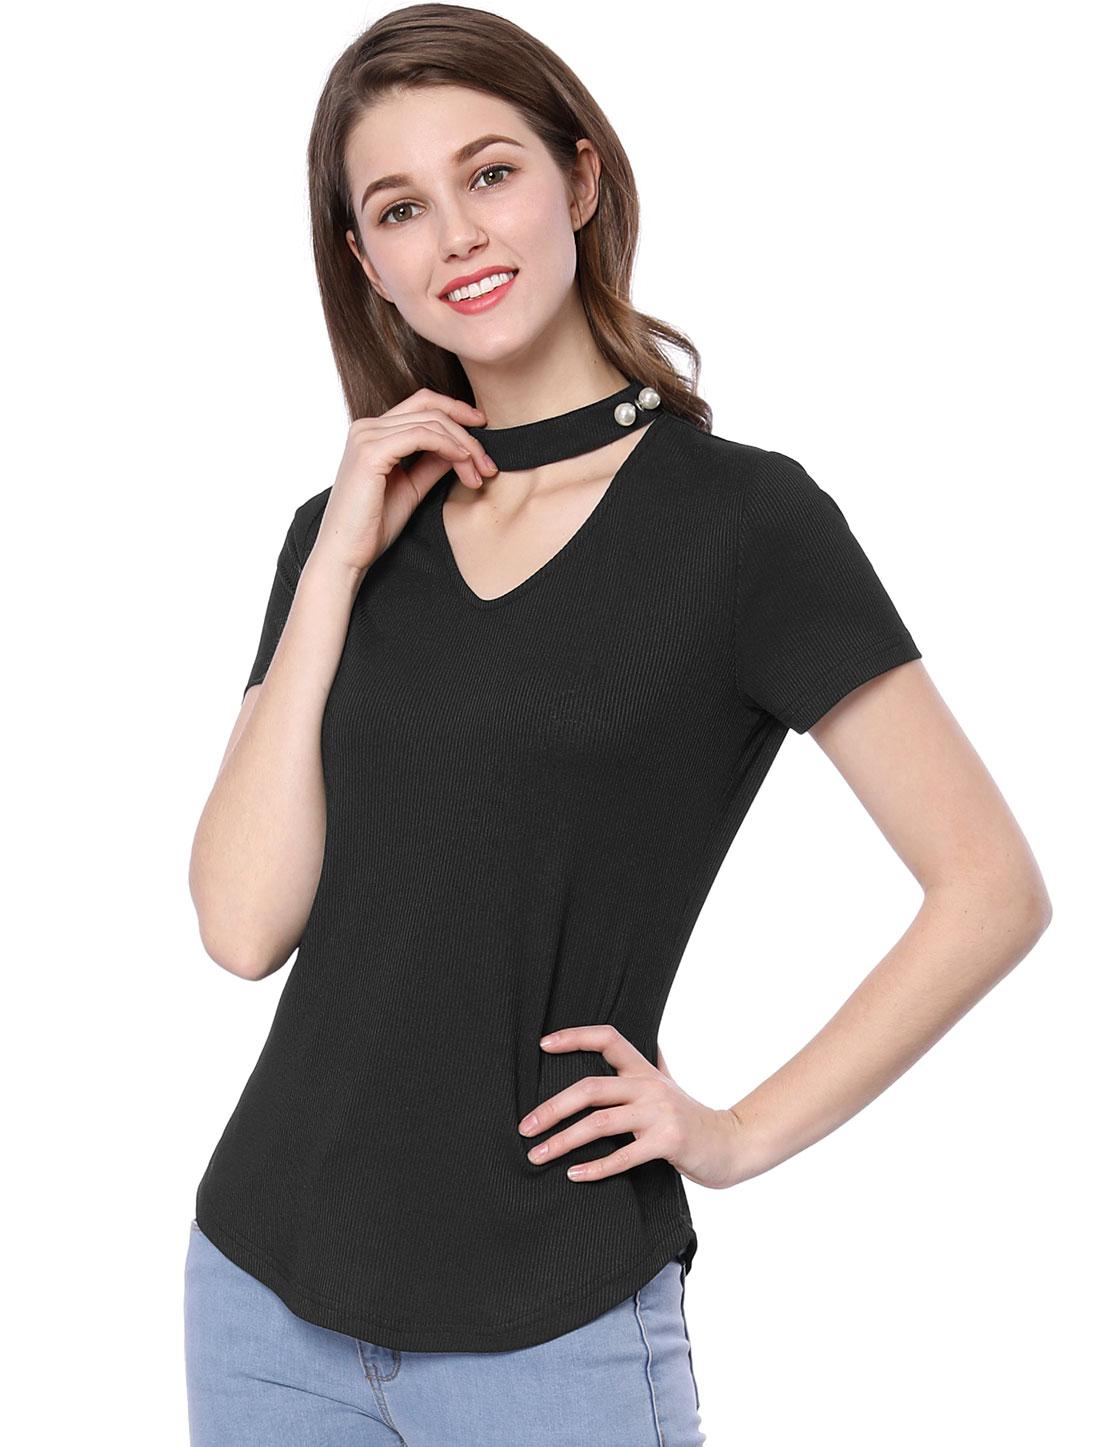 Allegra K Women Pearl Decor Choker Cut-out V-neck Ribbed Tunic Tops Black XL